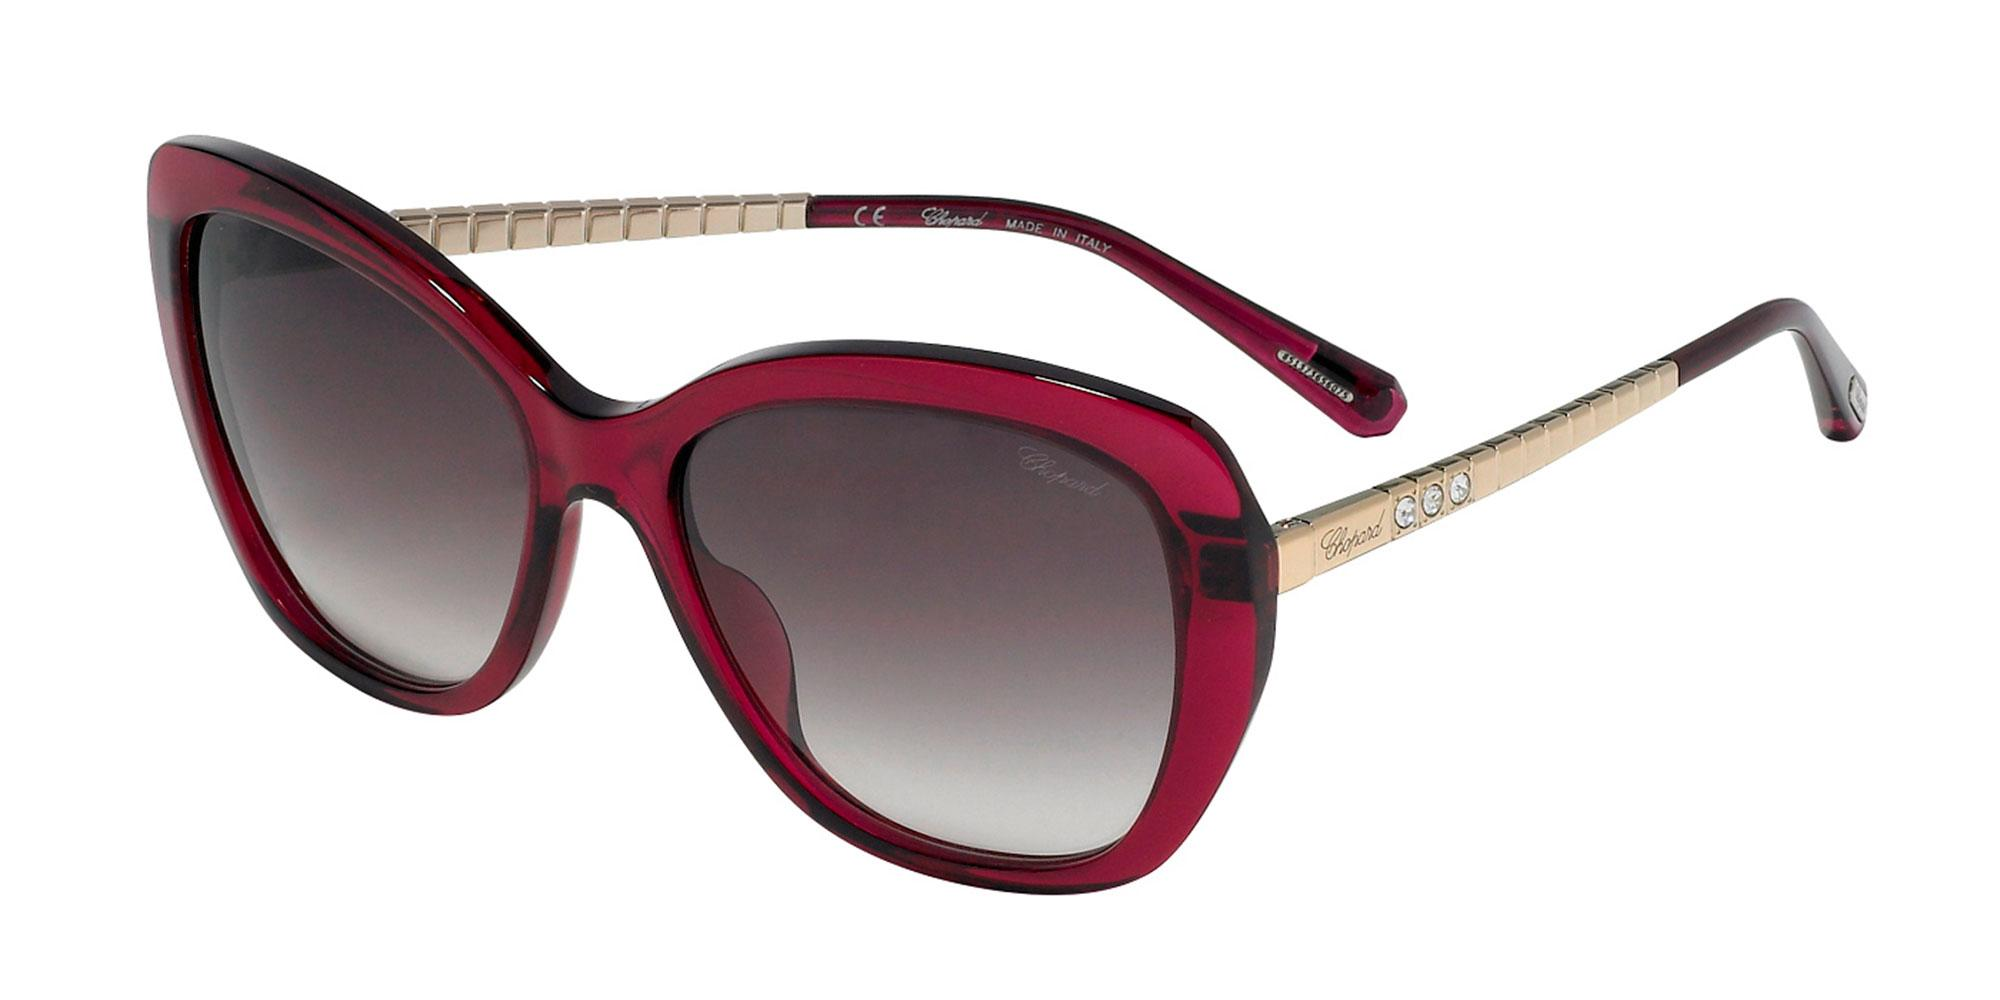 01BV SCH259S Sunglasses, Chopard